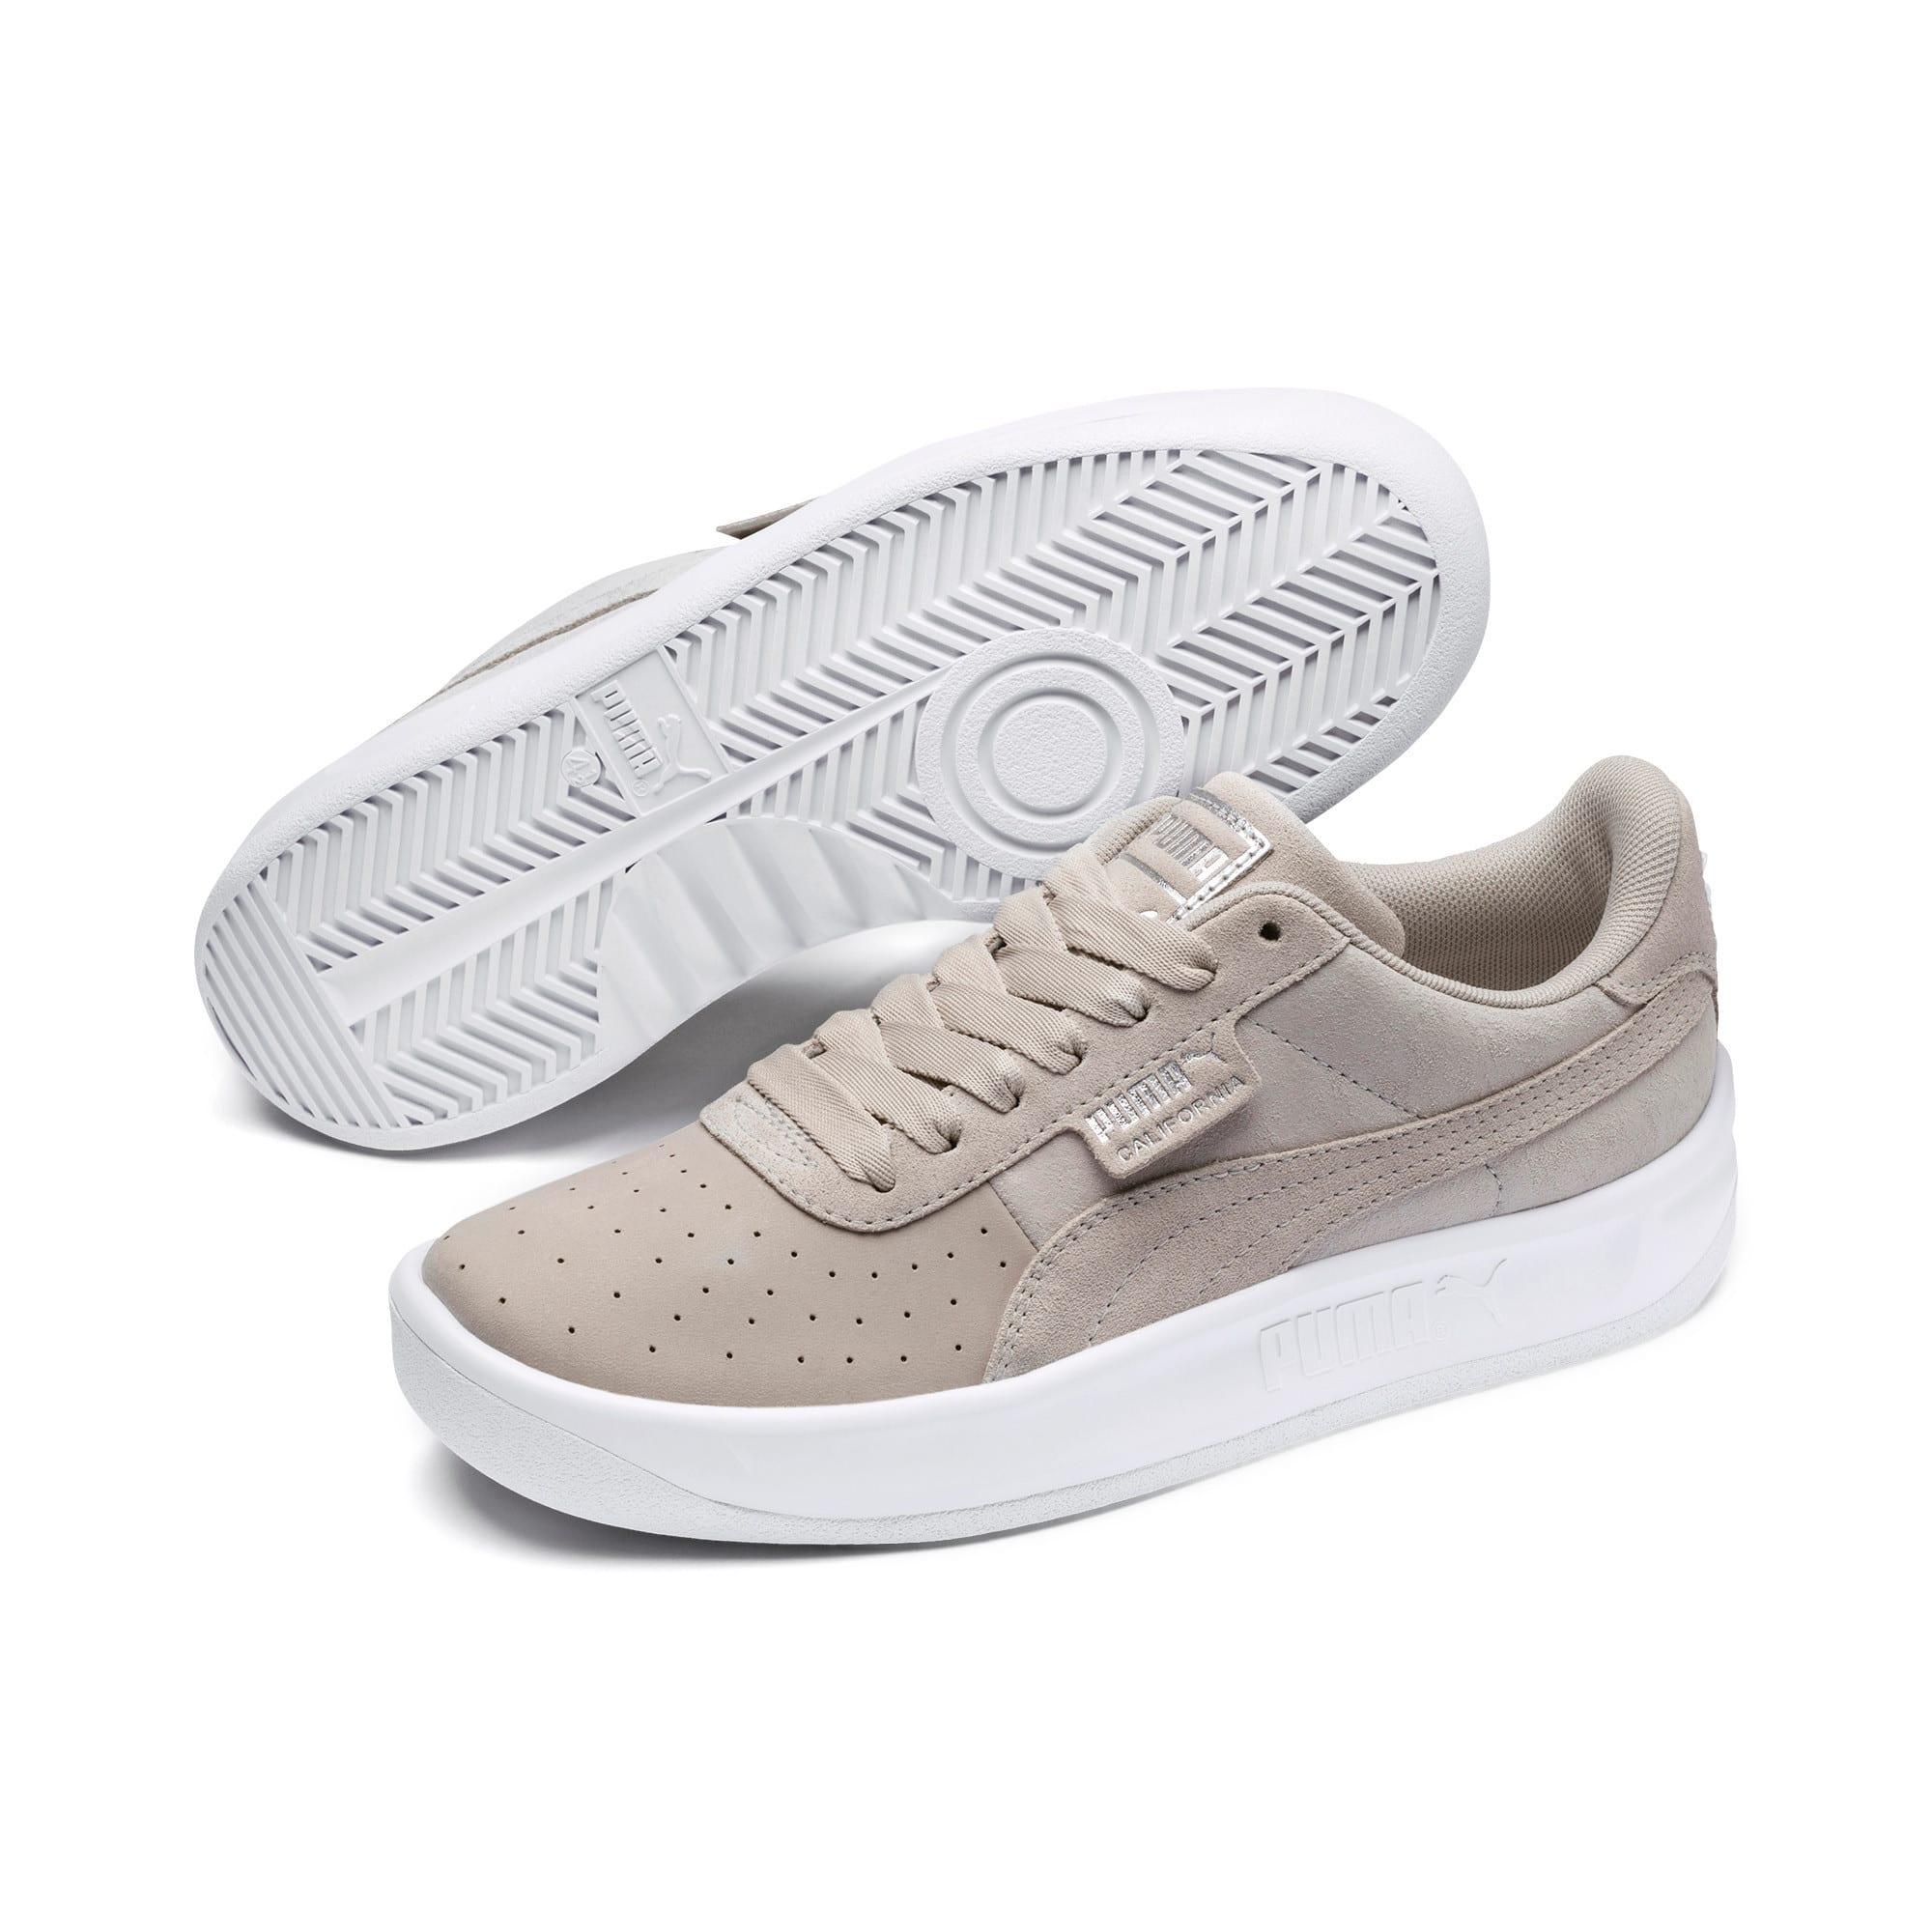 Thumbnail 3 of California Shimmer Damen Sneaker, Silver Gray-Puma Silver, medium